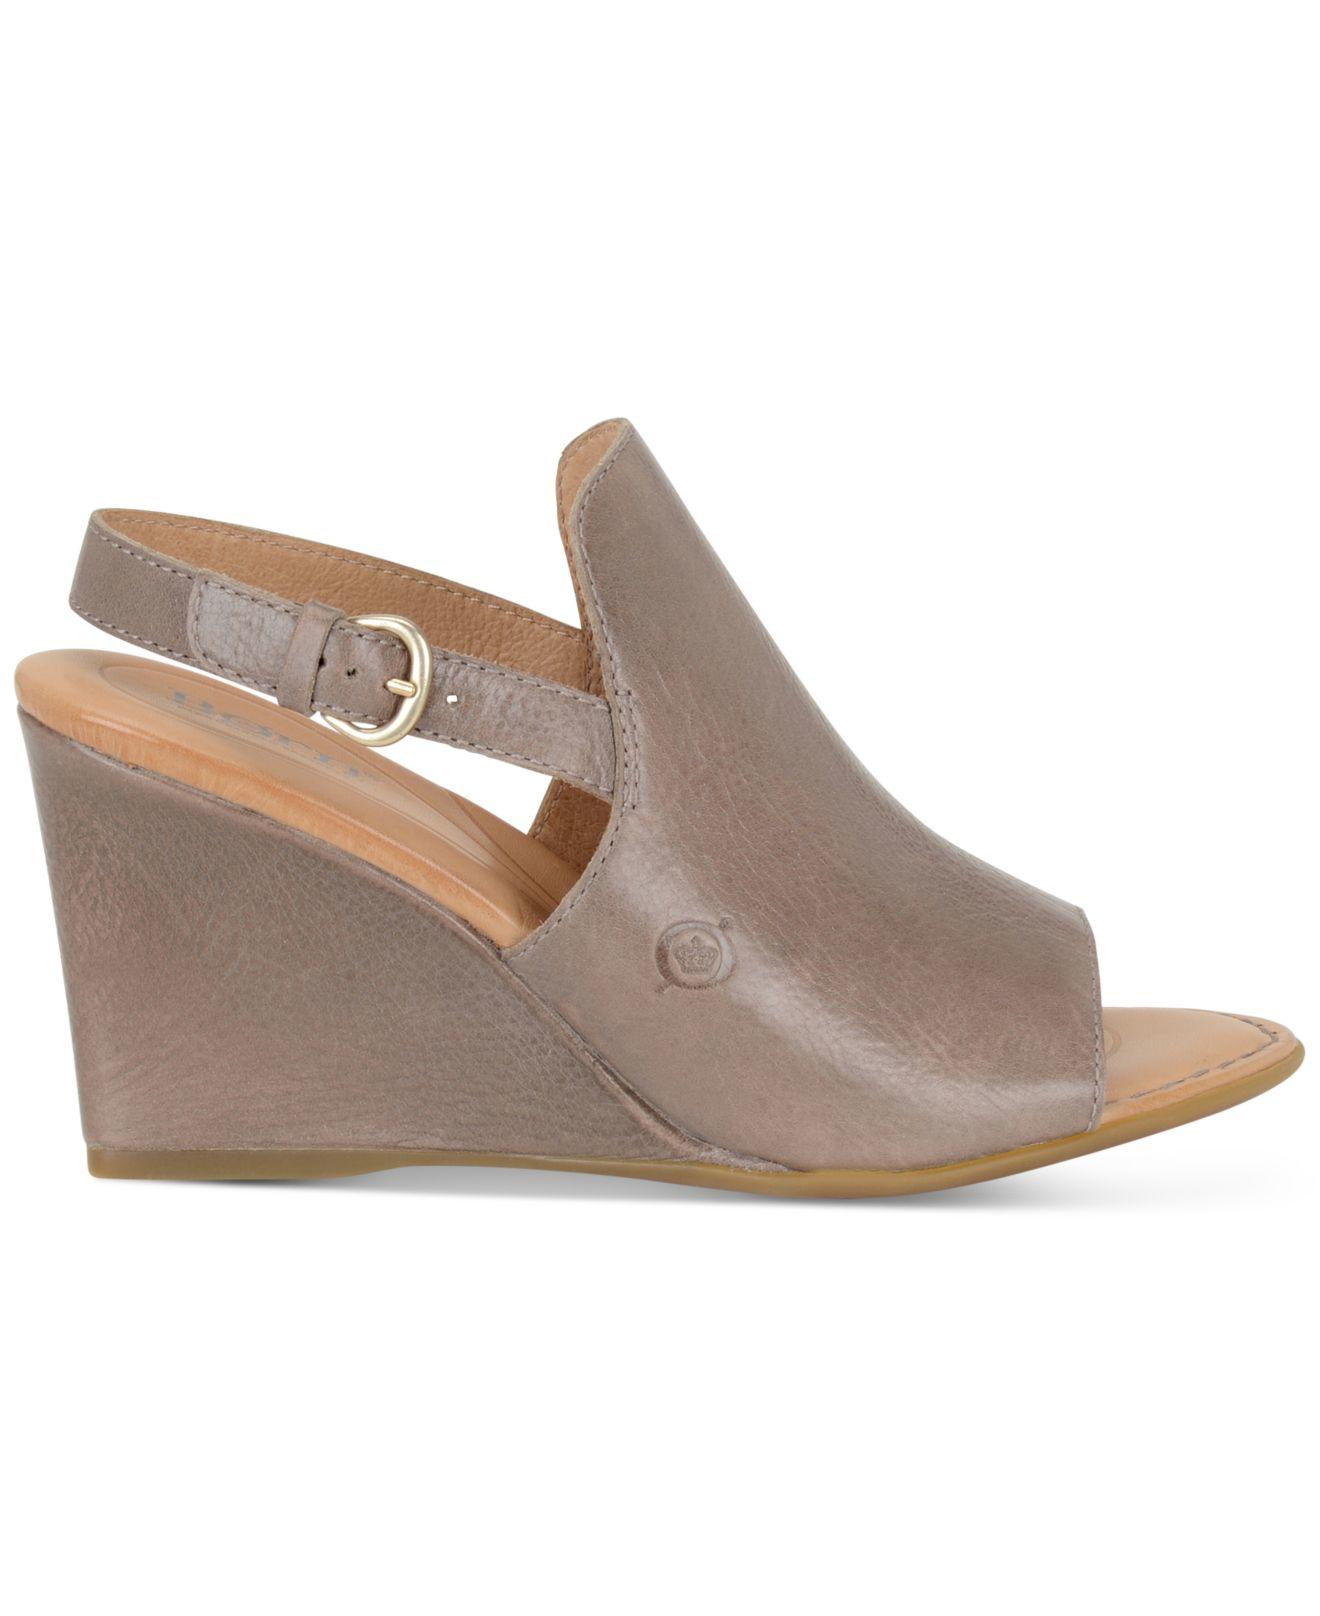 born bevi wedge sandals in grey lyst